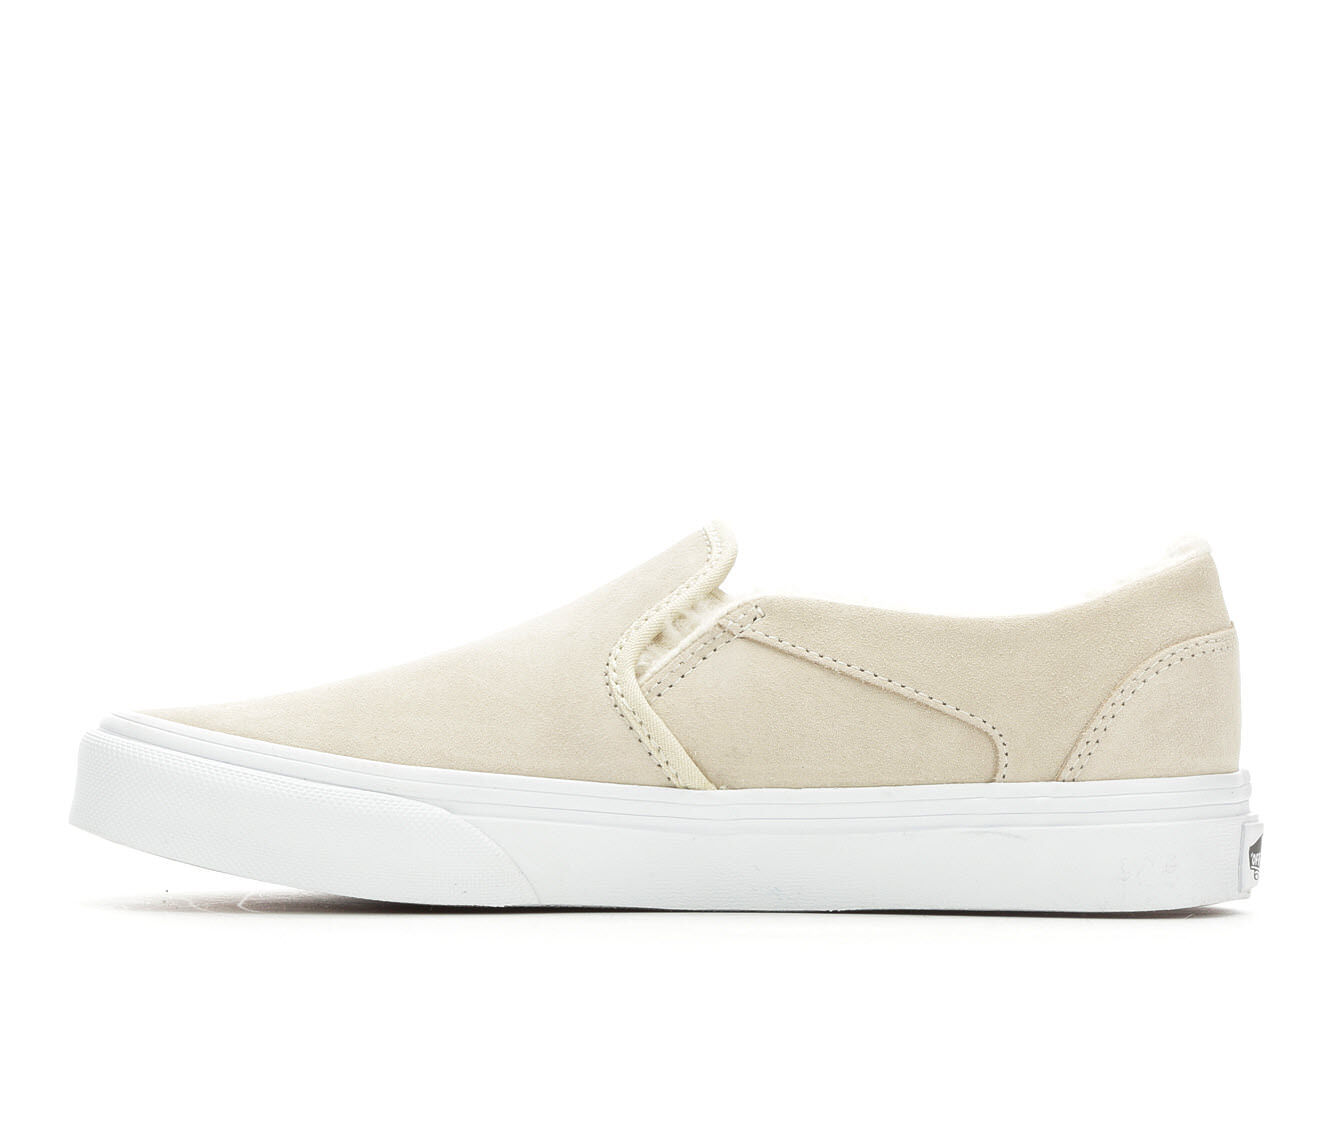 vans asher suede skate shoes